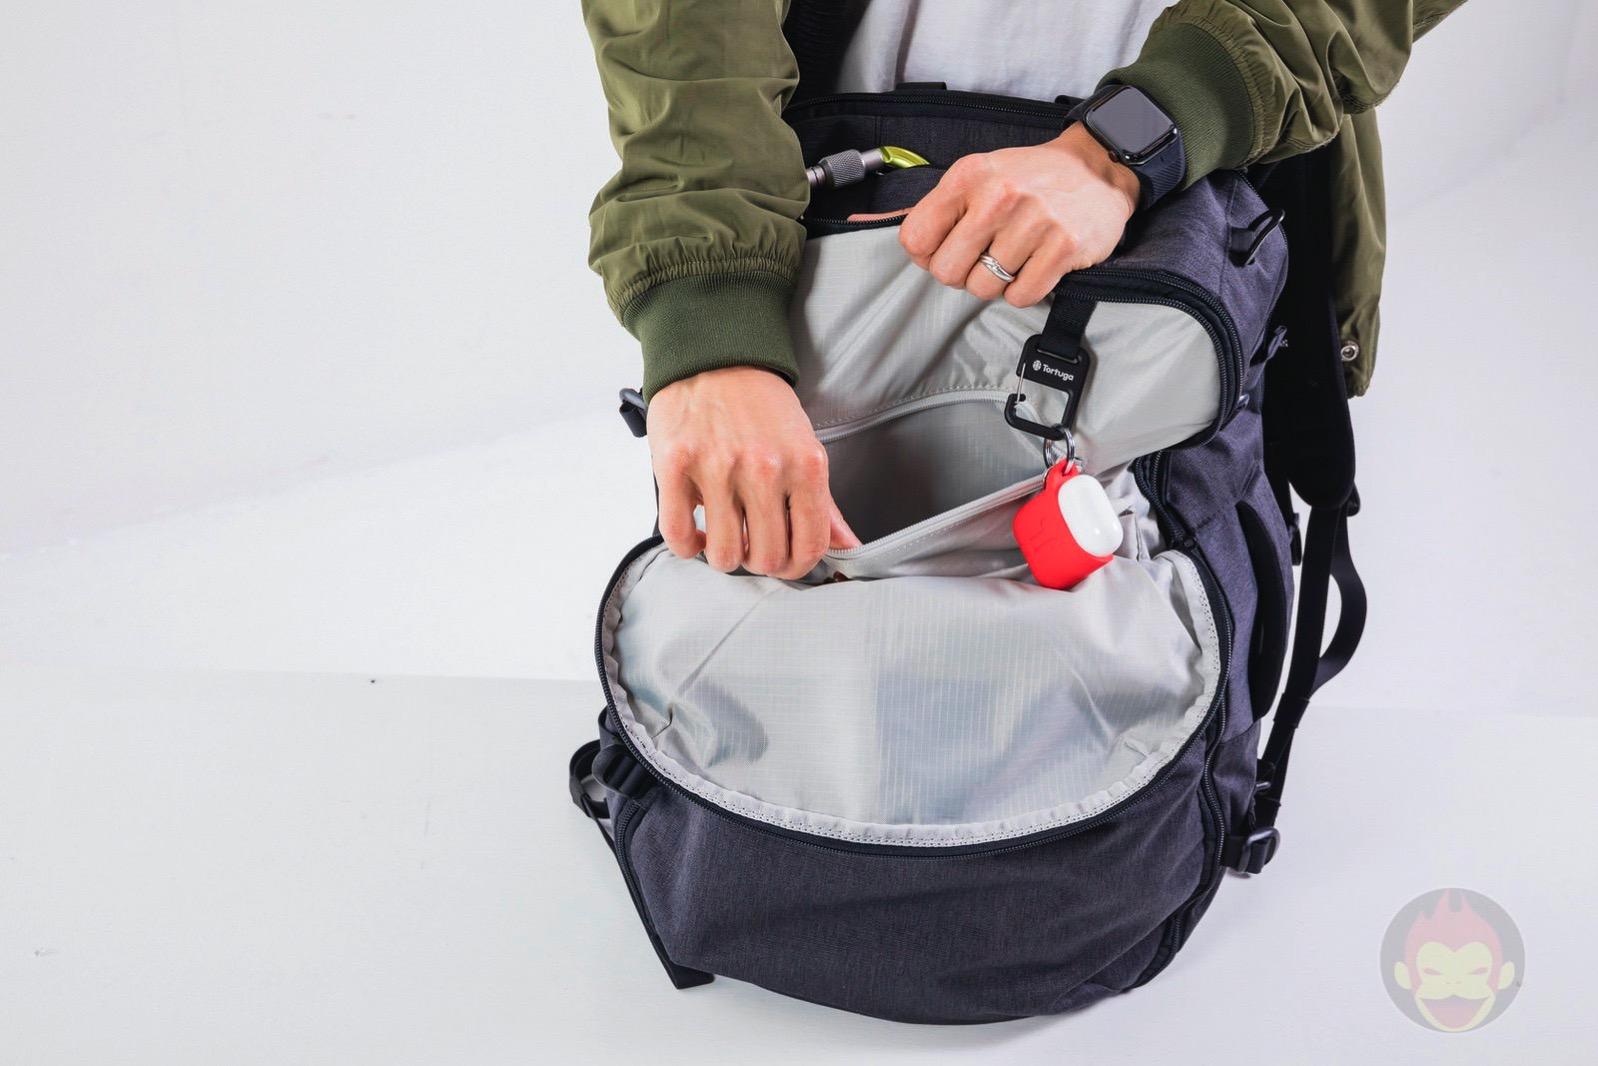 Tortuga-Setout-Backpack-35liter-review-20.jpg